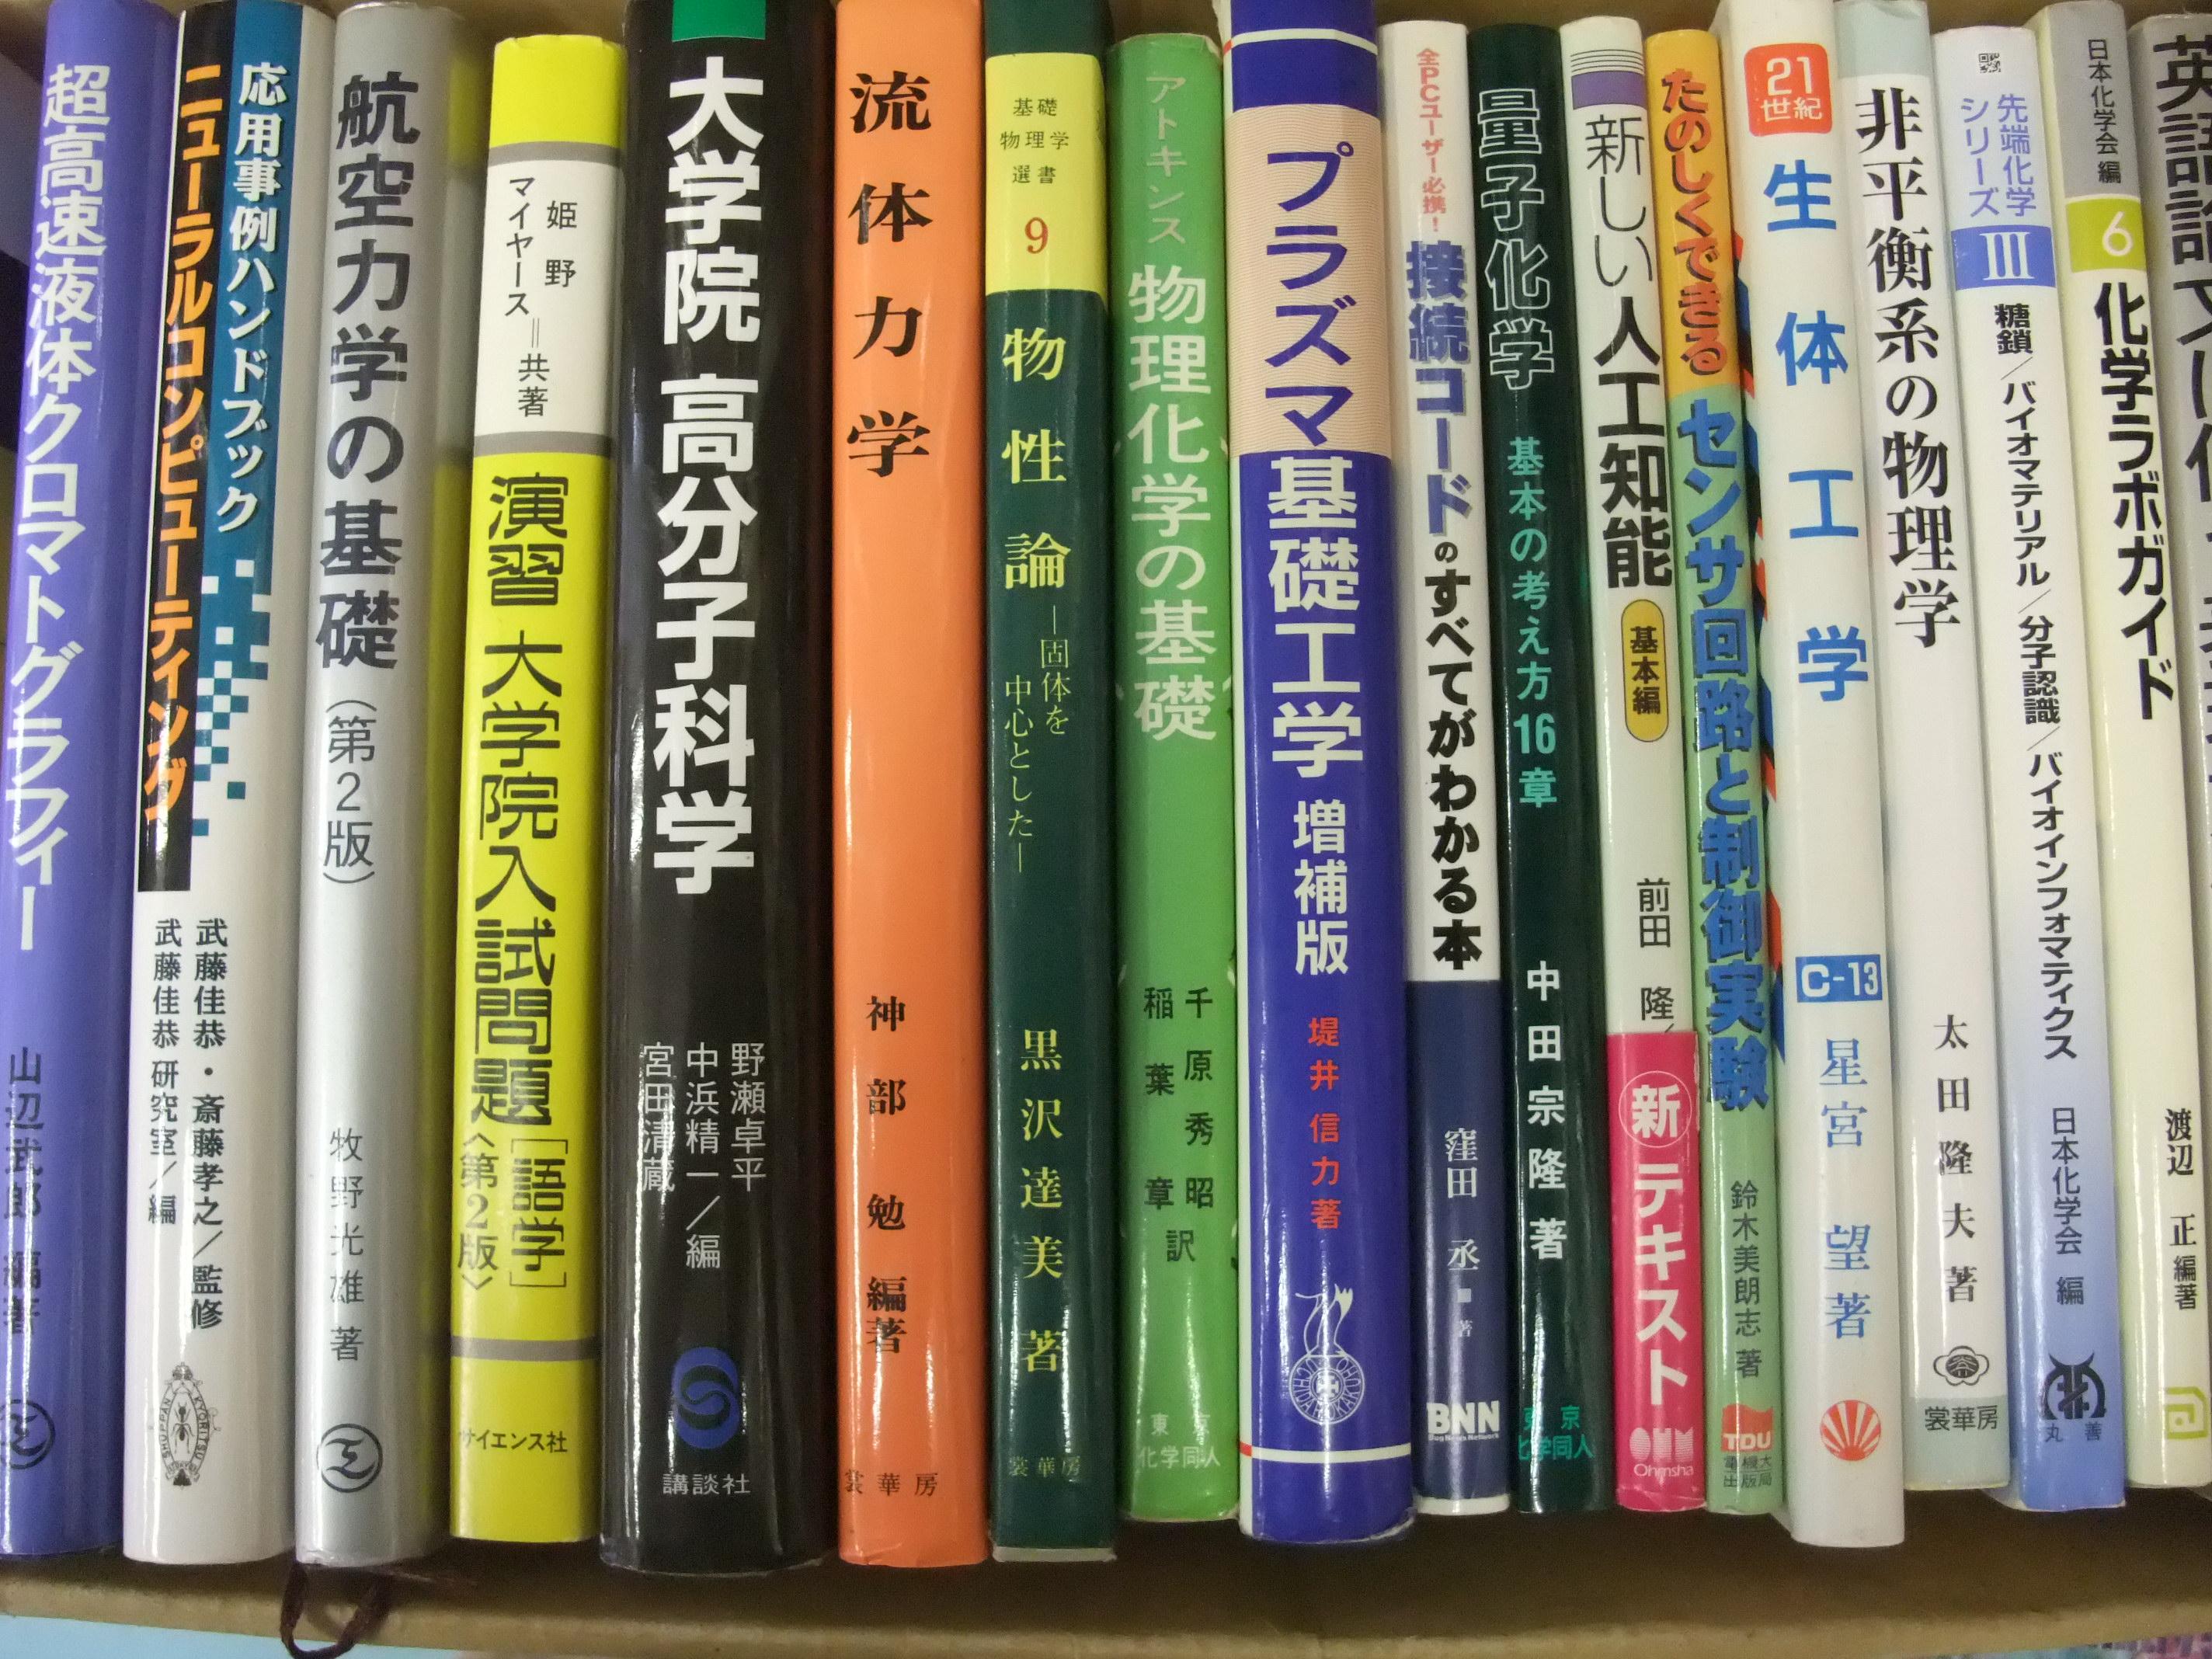 静岡市葵区 出張買取 物理学の本「流体力学 航空力学の基礎」